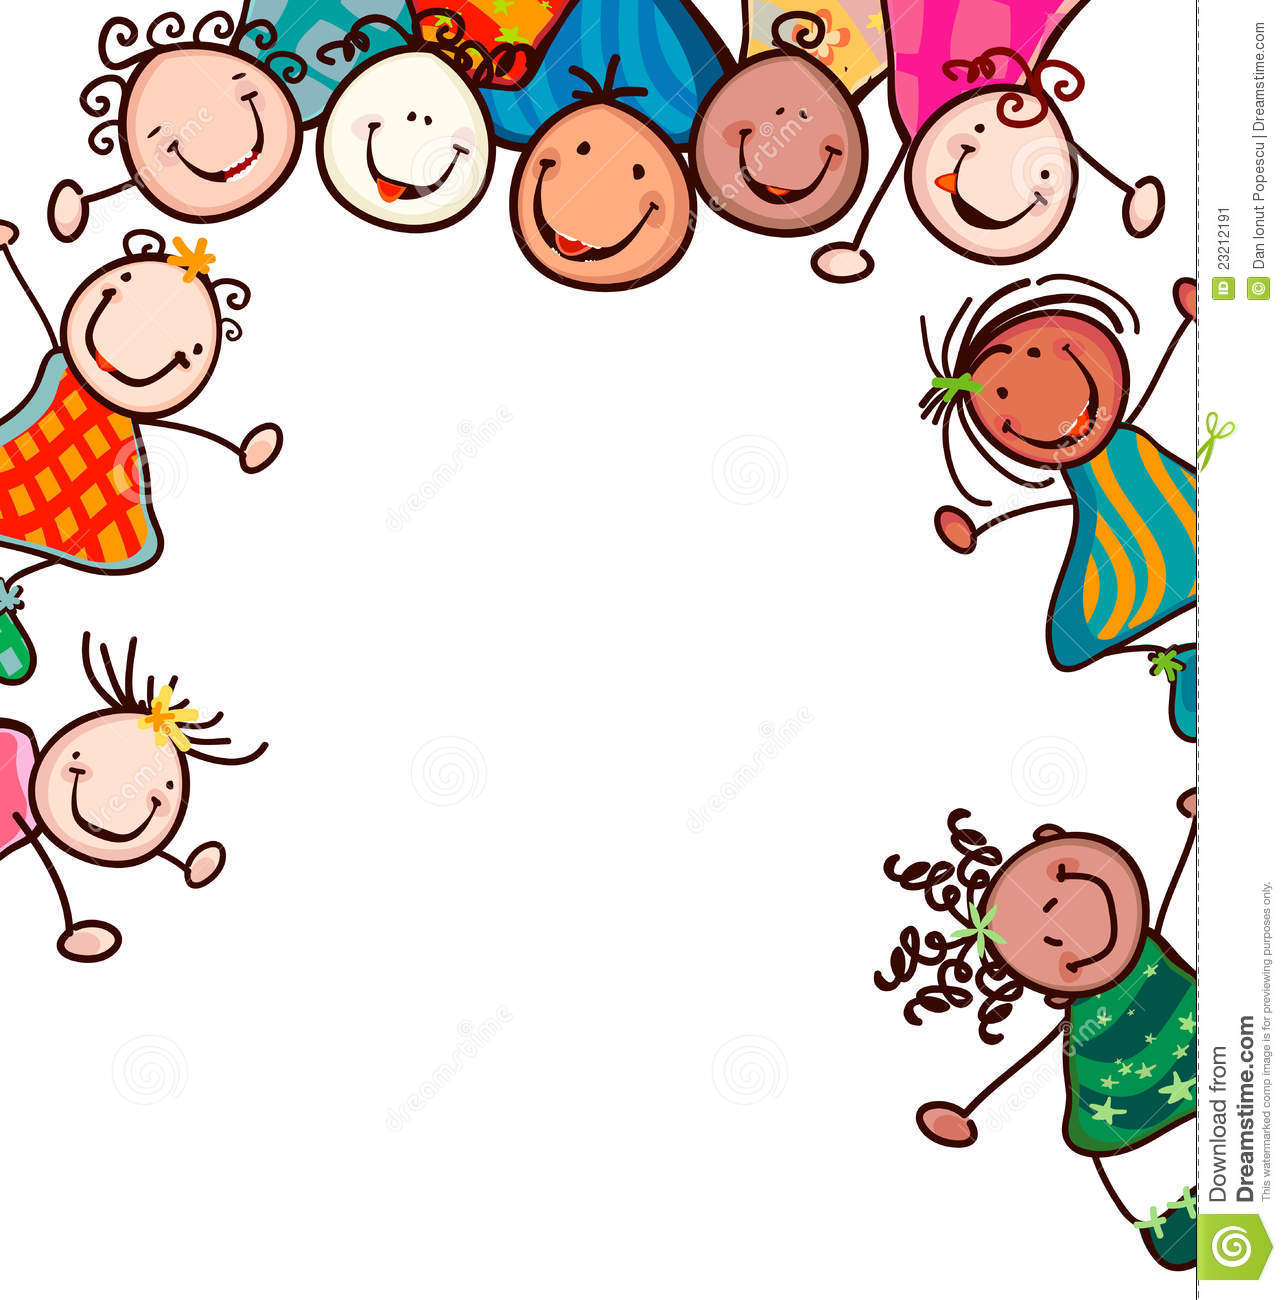 Clip Art, Children Holding .-Clip art, Children holding .-6